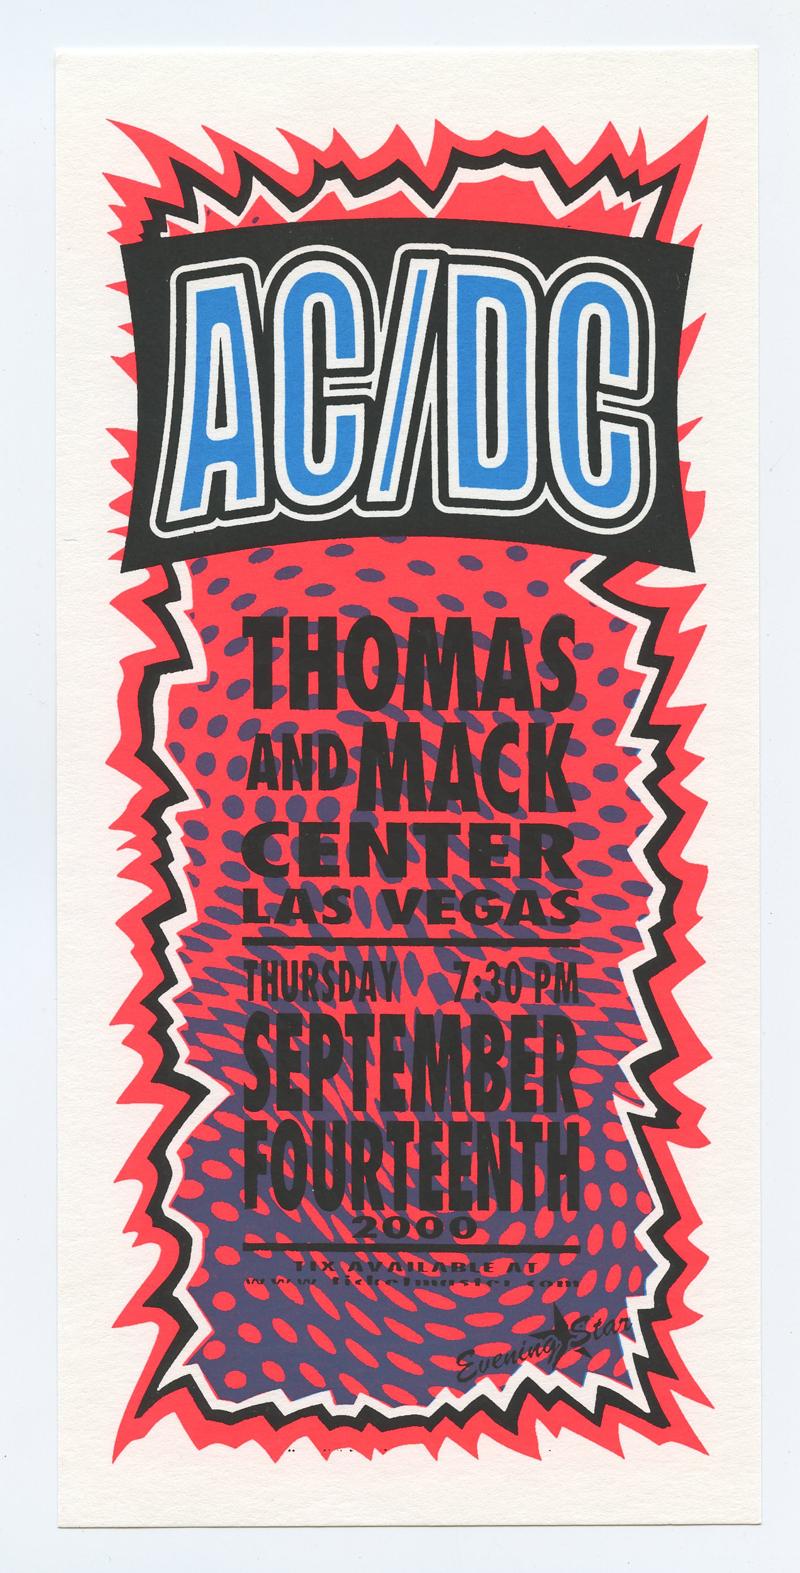 AC/DC Handbill 2000 Sep 4 Thomas and Mac Center Las Vegas Mark Arminski